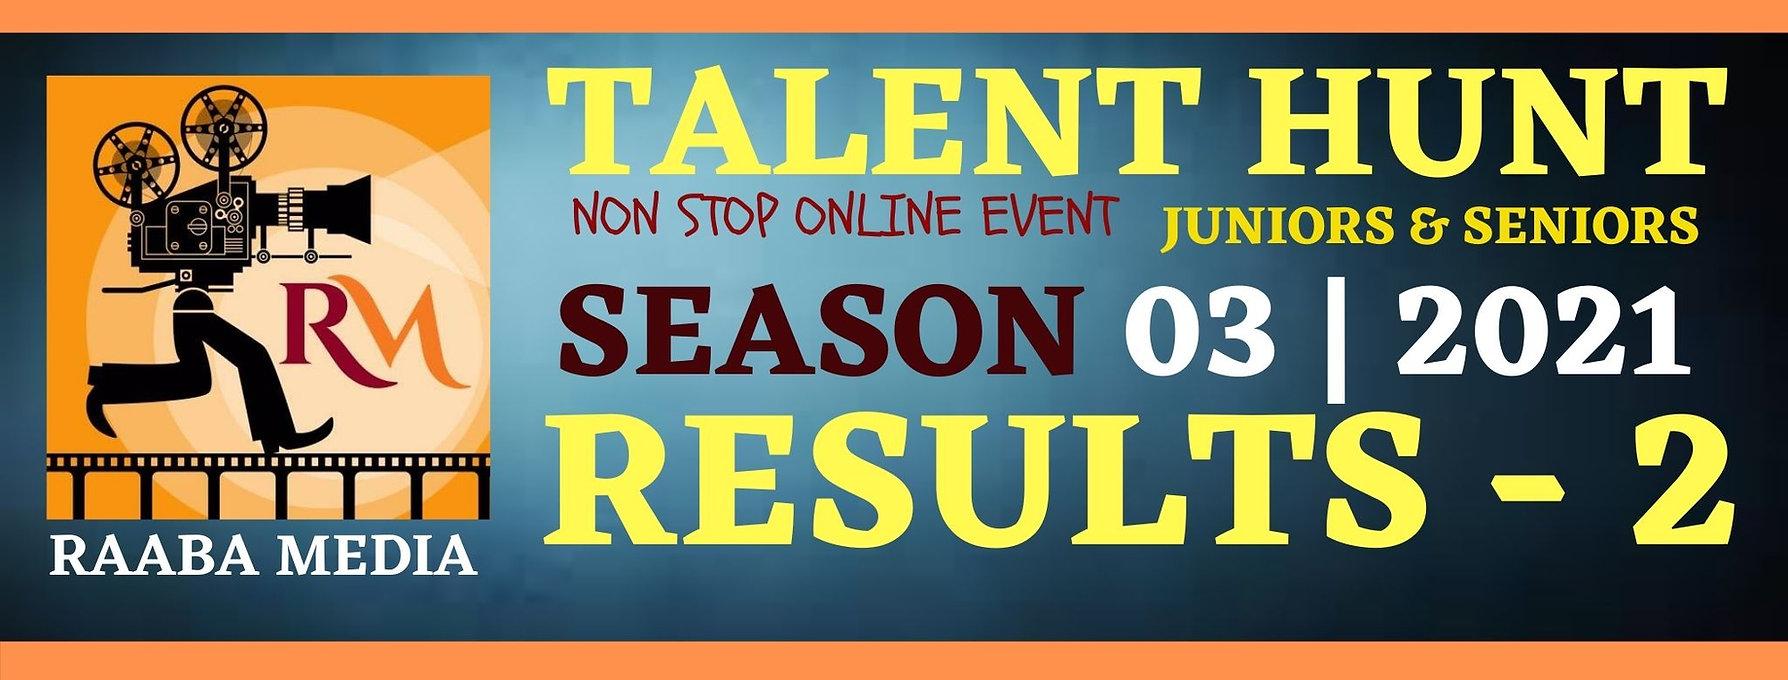 talent hunt non stop online event (5).jp